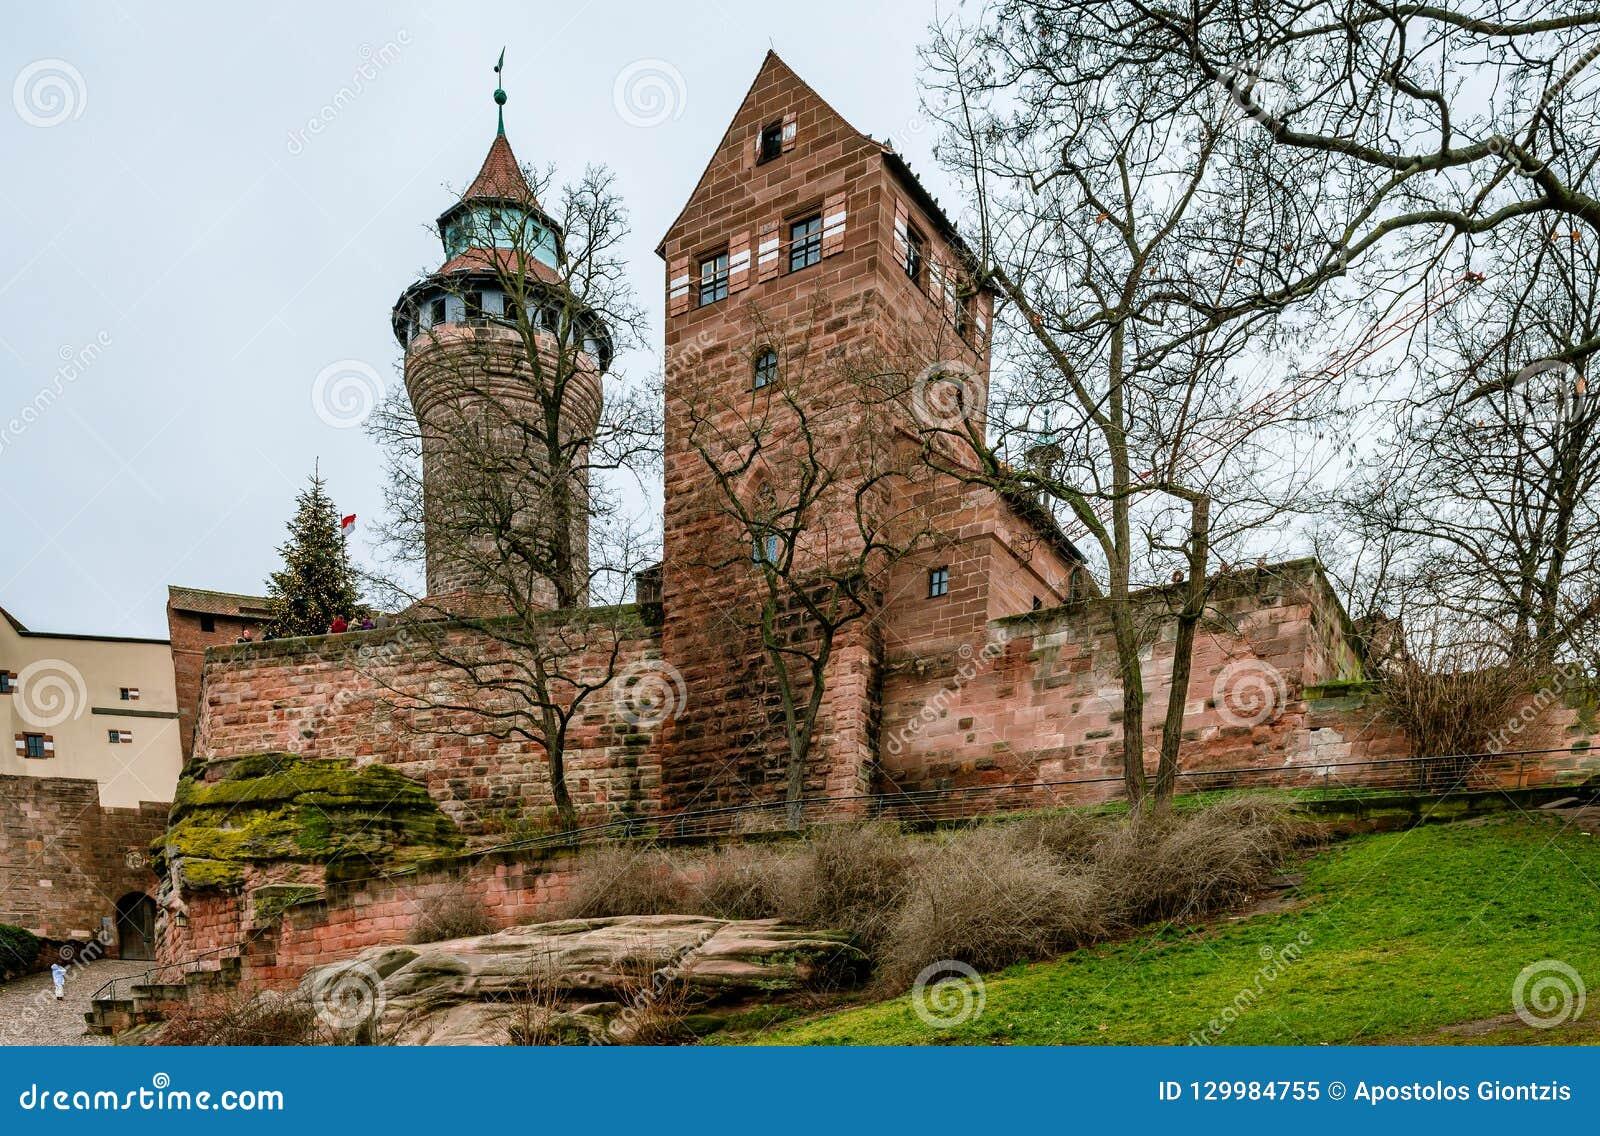 The Nuremberg Castle.